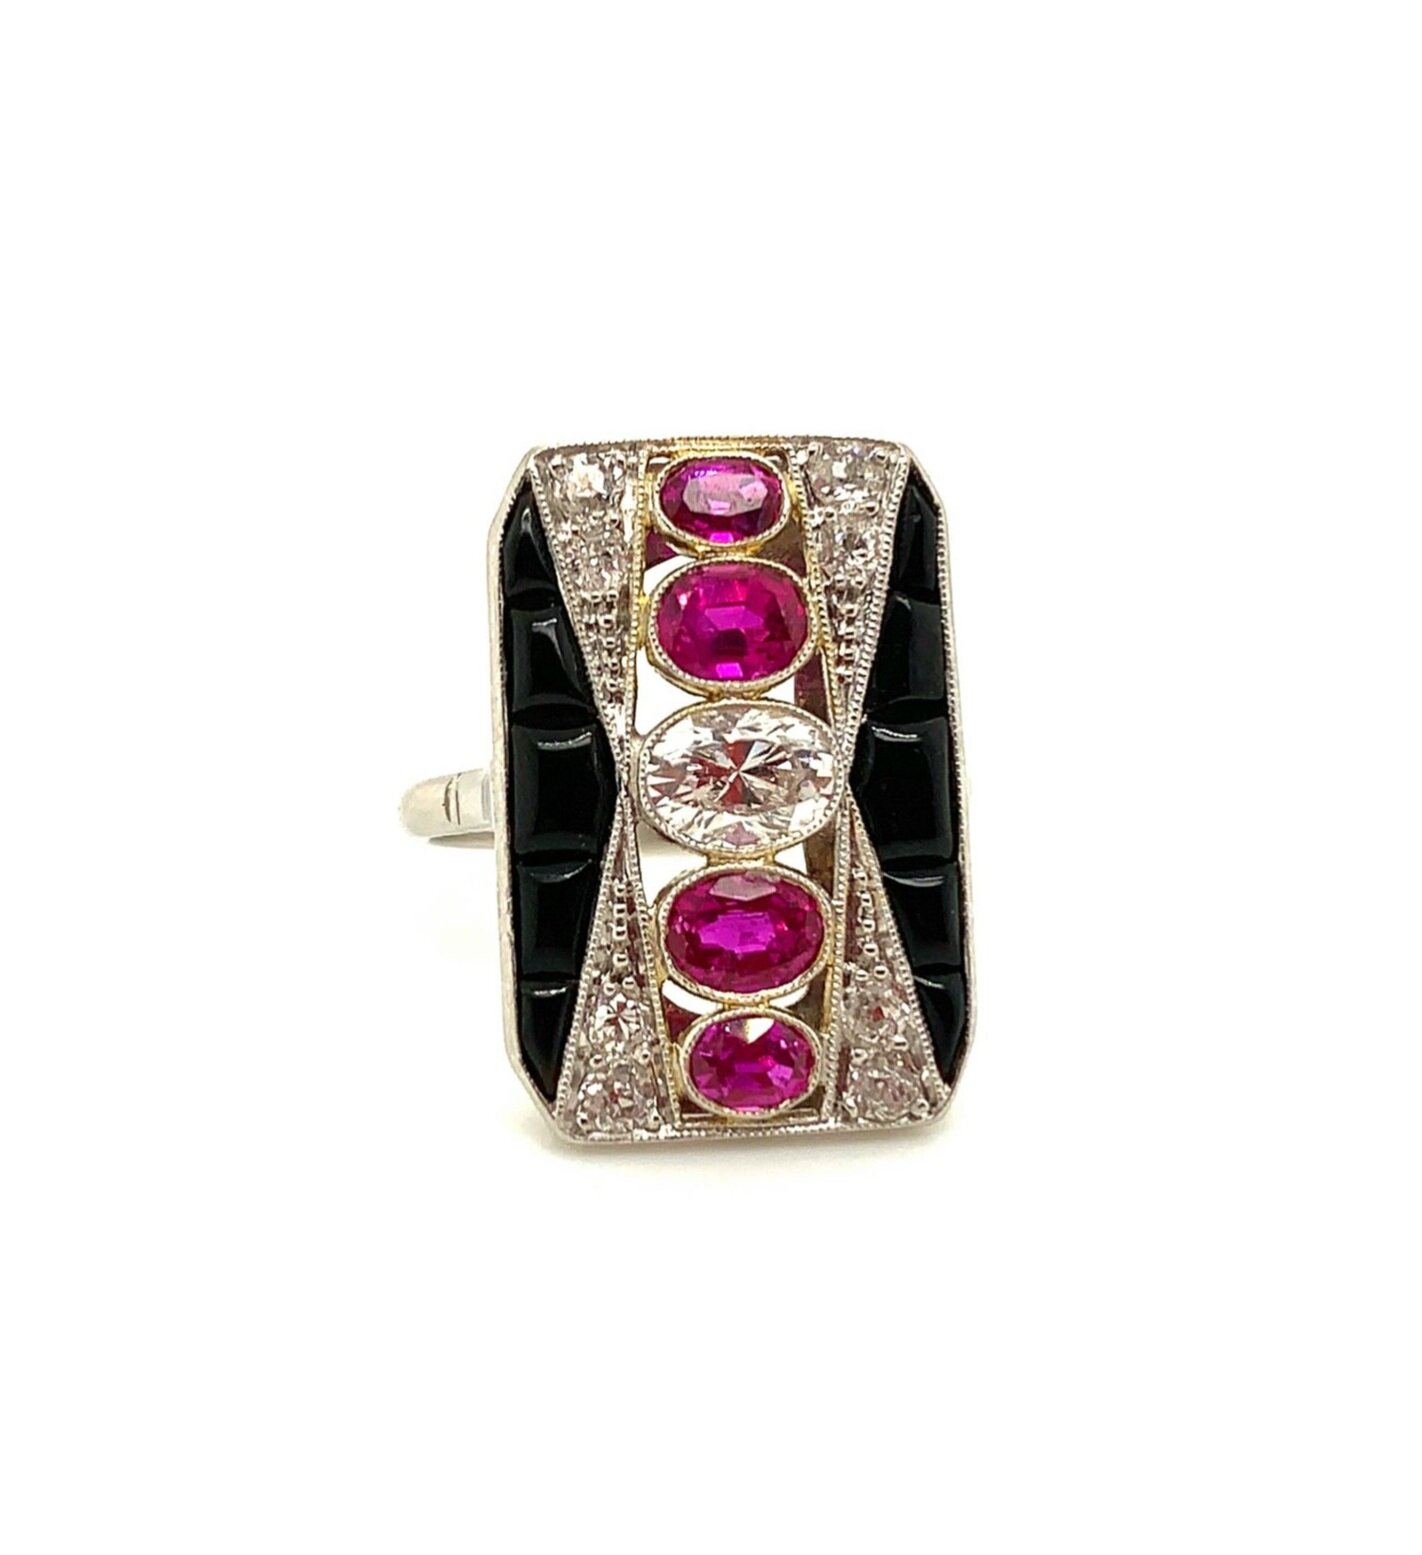 Art Deco Ruby, Diamond, and Onyx Ring   Est. US$ 4,500-5,500